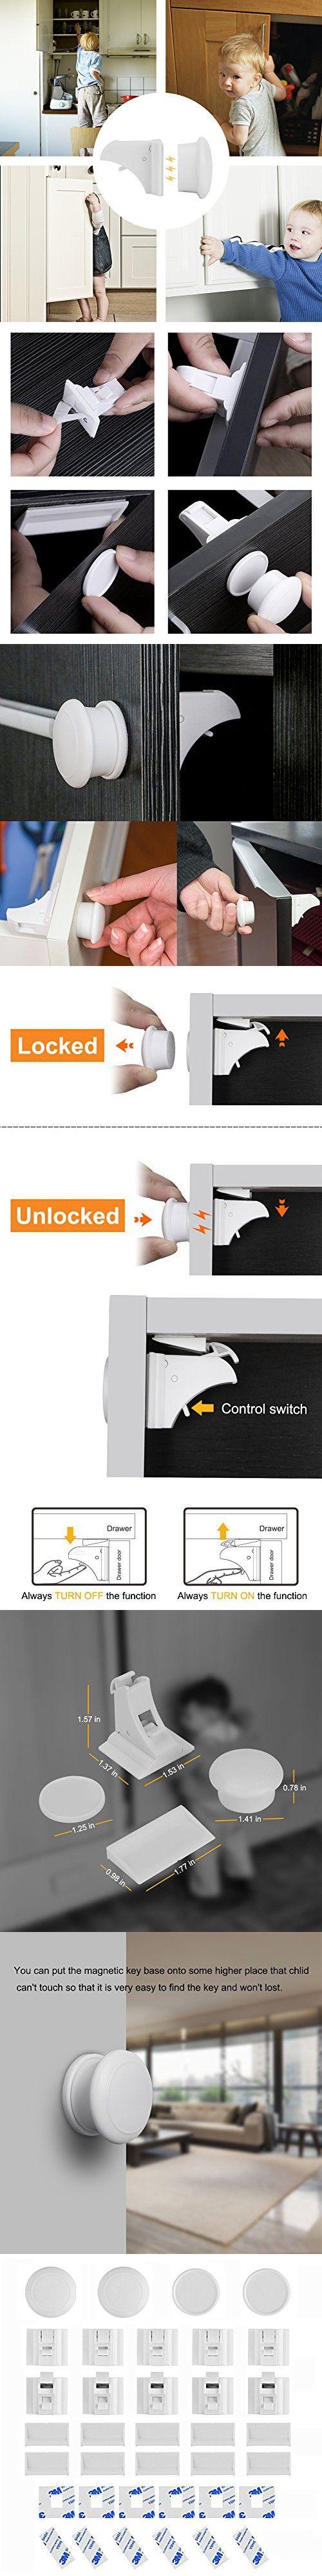 Safety 1st 8 lock complete magnetic locking system set safety 1st - Linkax Baby Magnetic Locks Safety Magnetic Cabinet Lock Set 10 Locks 2 Keys